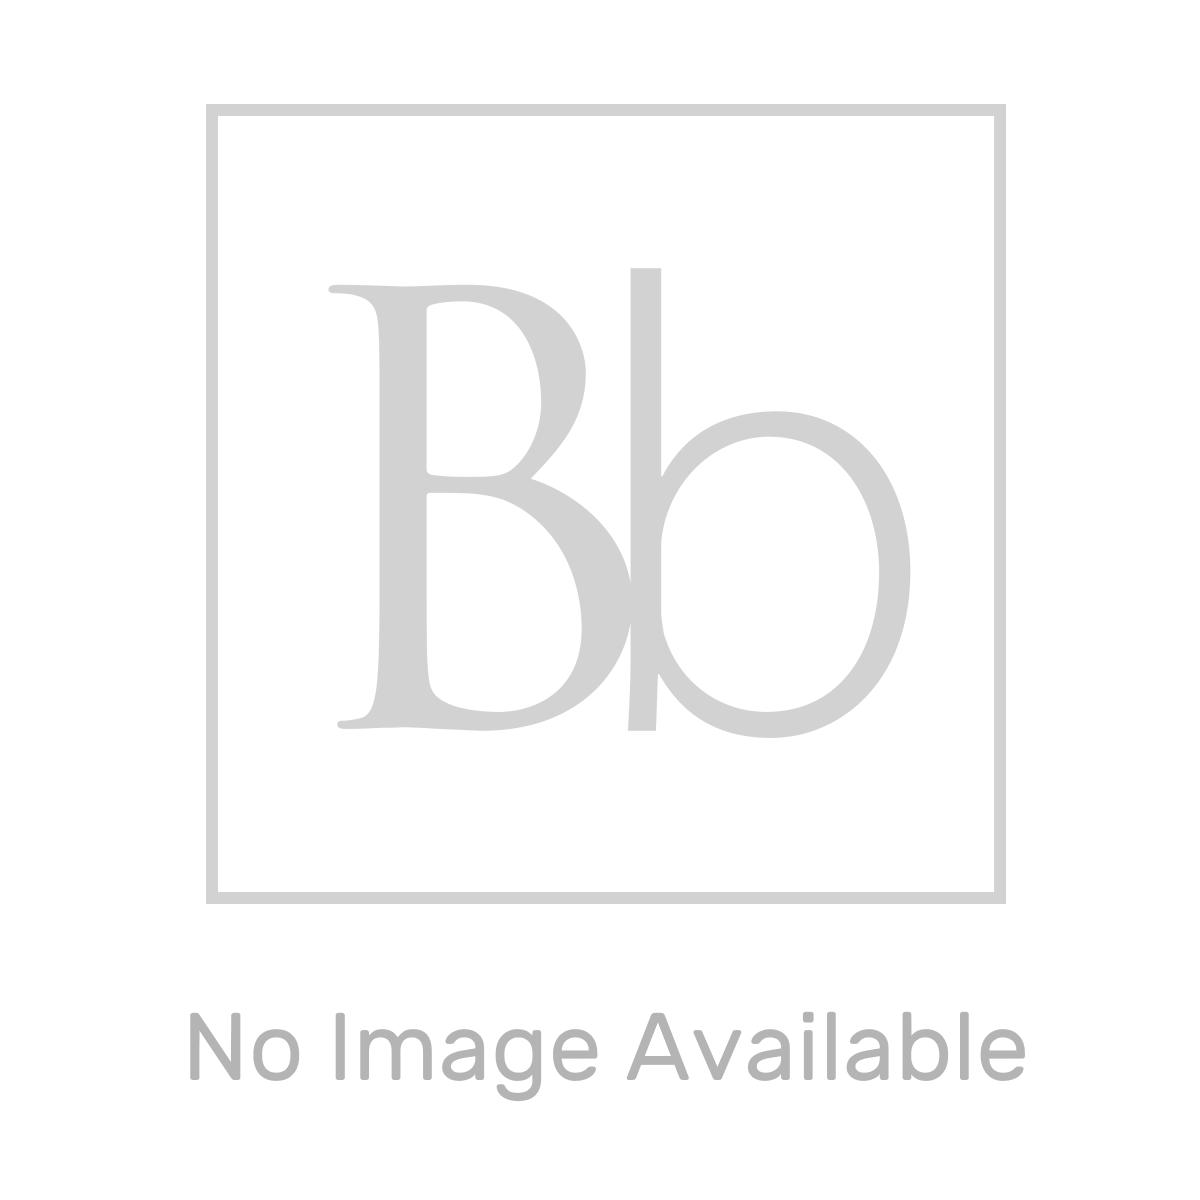 Aquadart White Slate Shower Tray 1600 x 900 Lifestyle